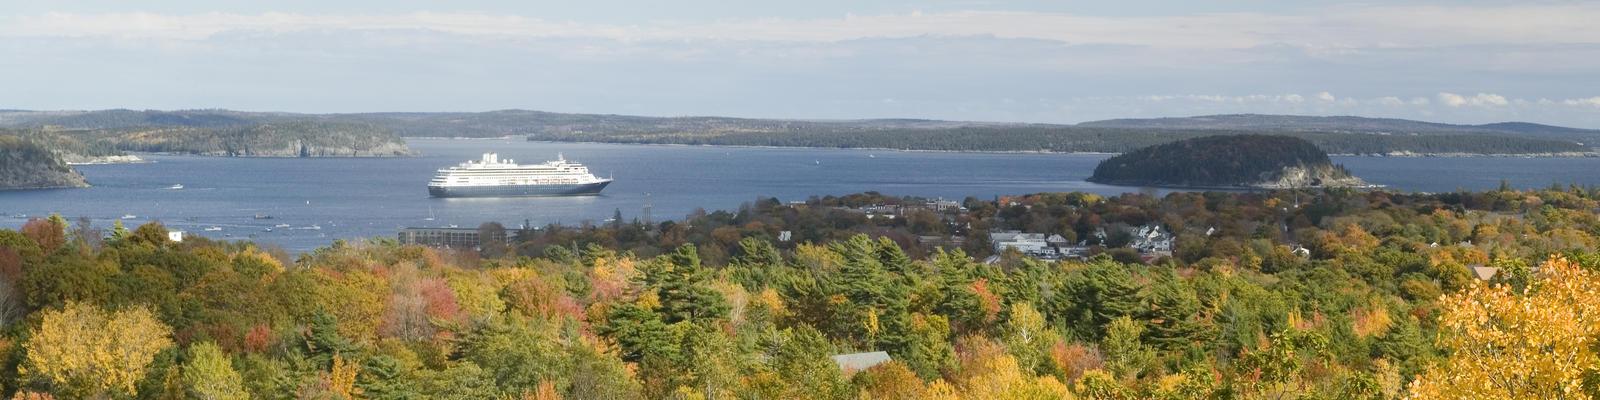 Cruise ship sailing past an autumn landscape (Photo: Joseph Sohm/Shutterstock)